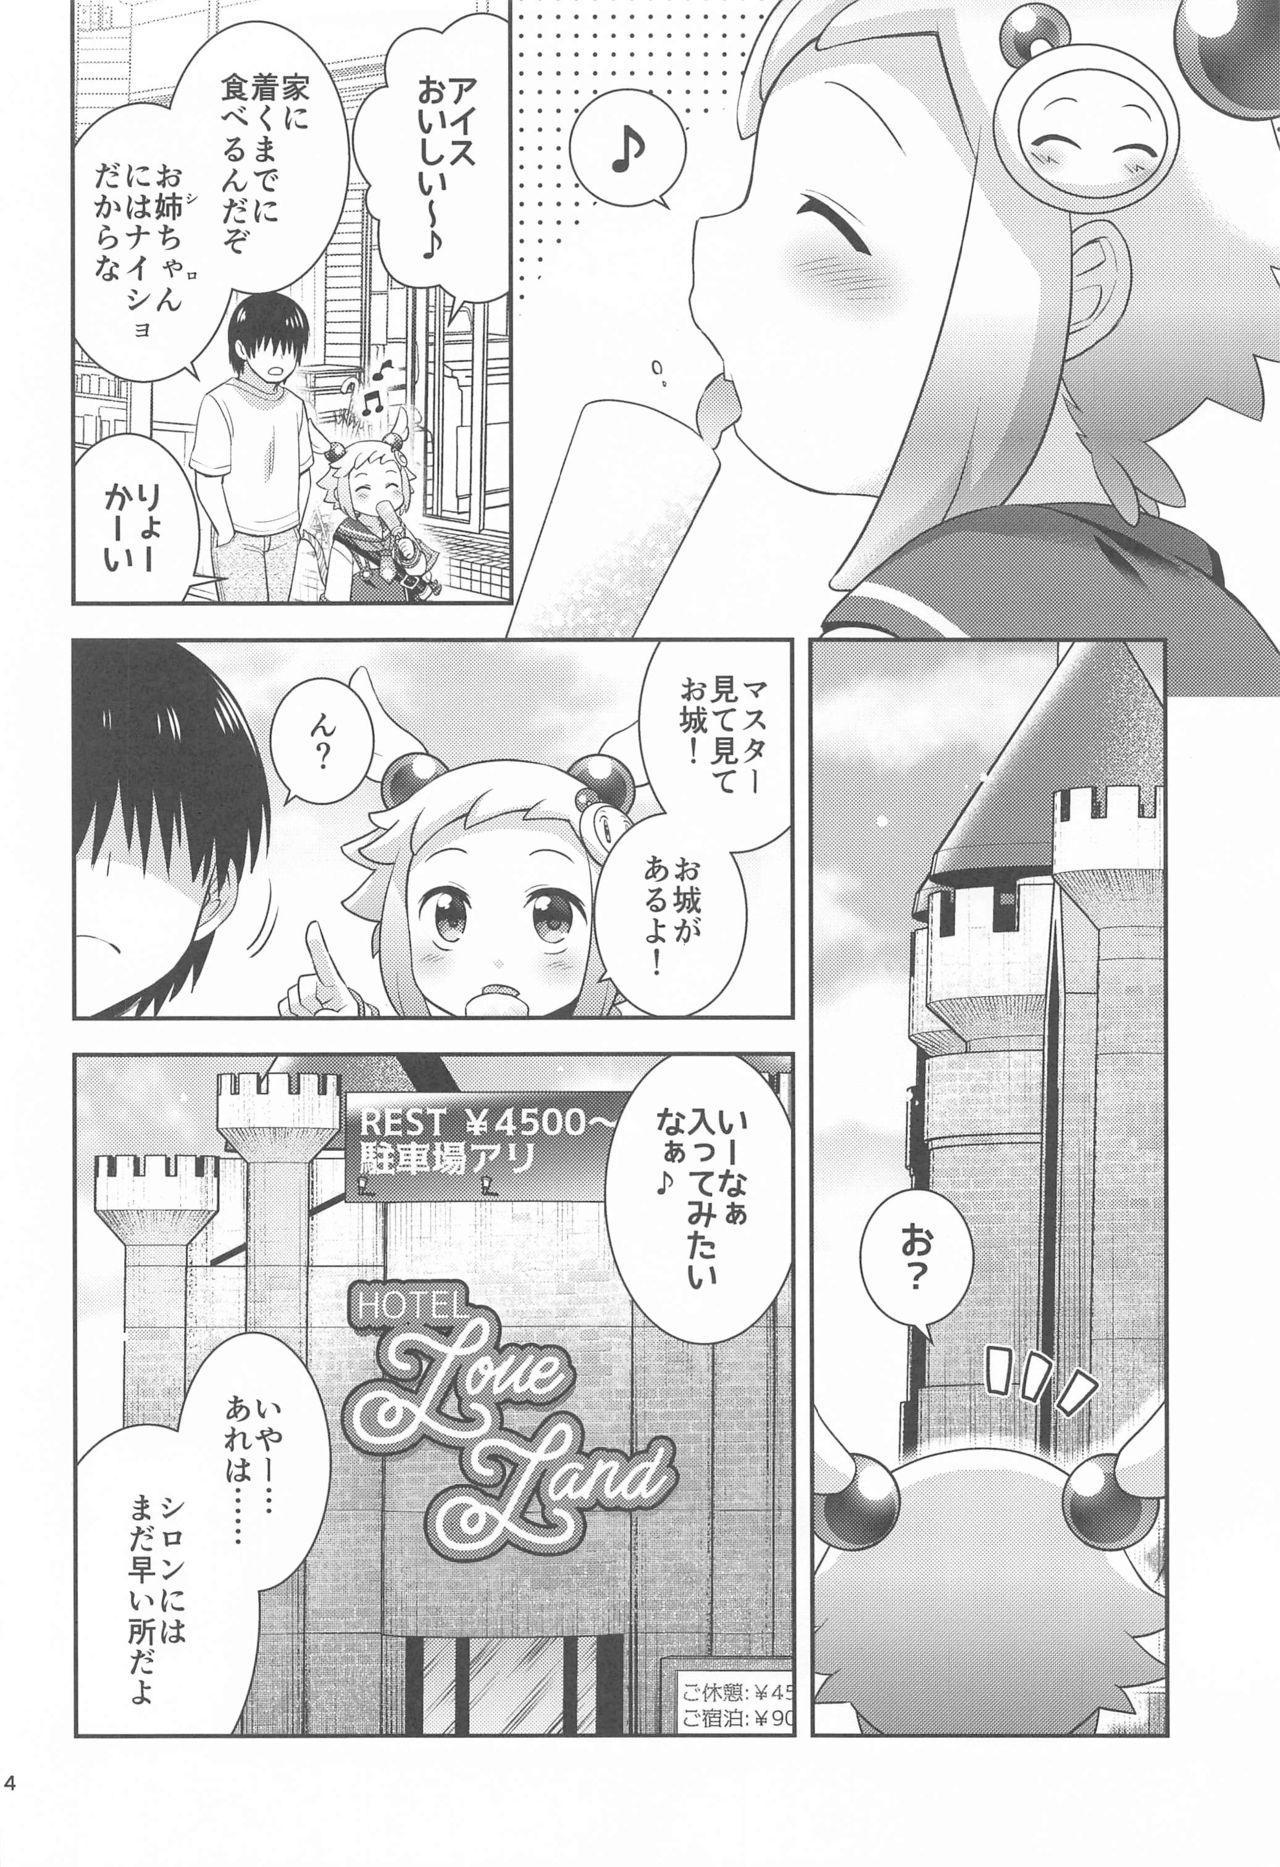 Shiron to LoveHo de Ecchi Suru 2